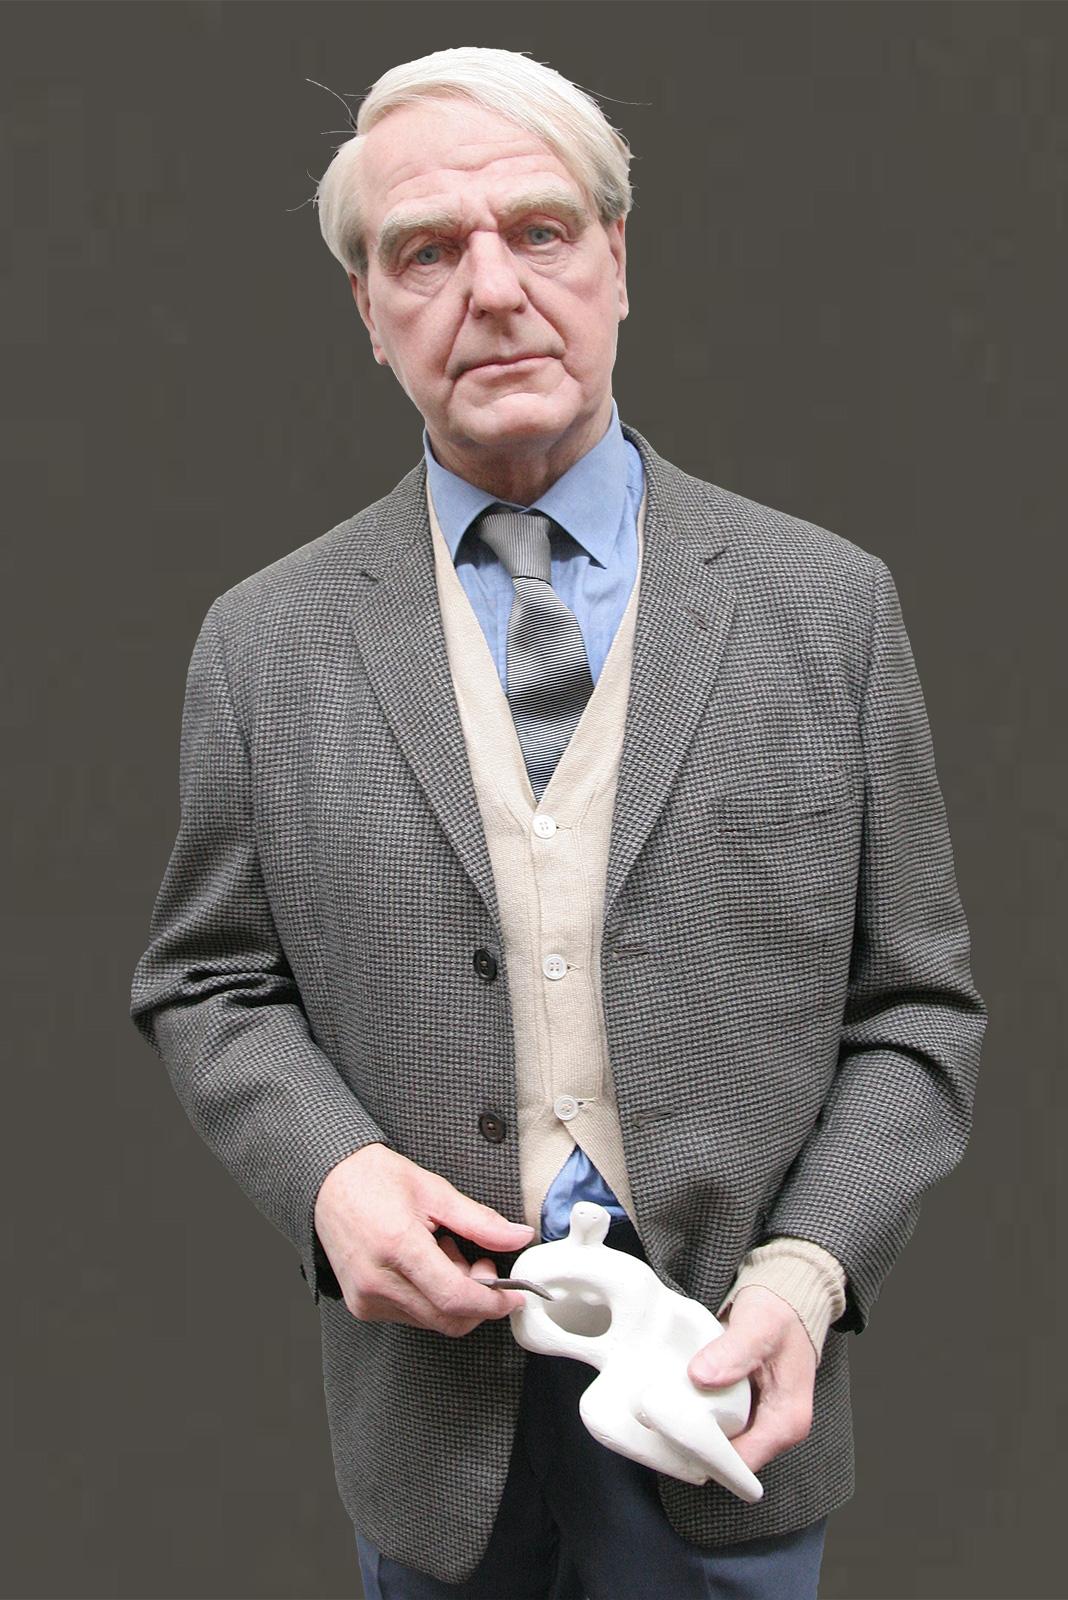 Sculpture of Henry Moore by Karen Newman